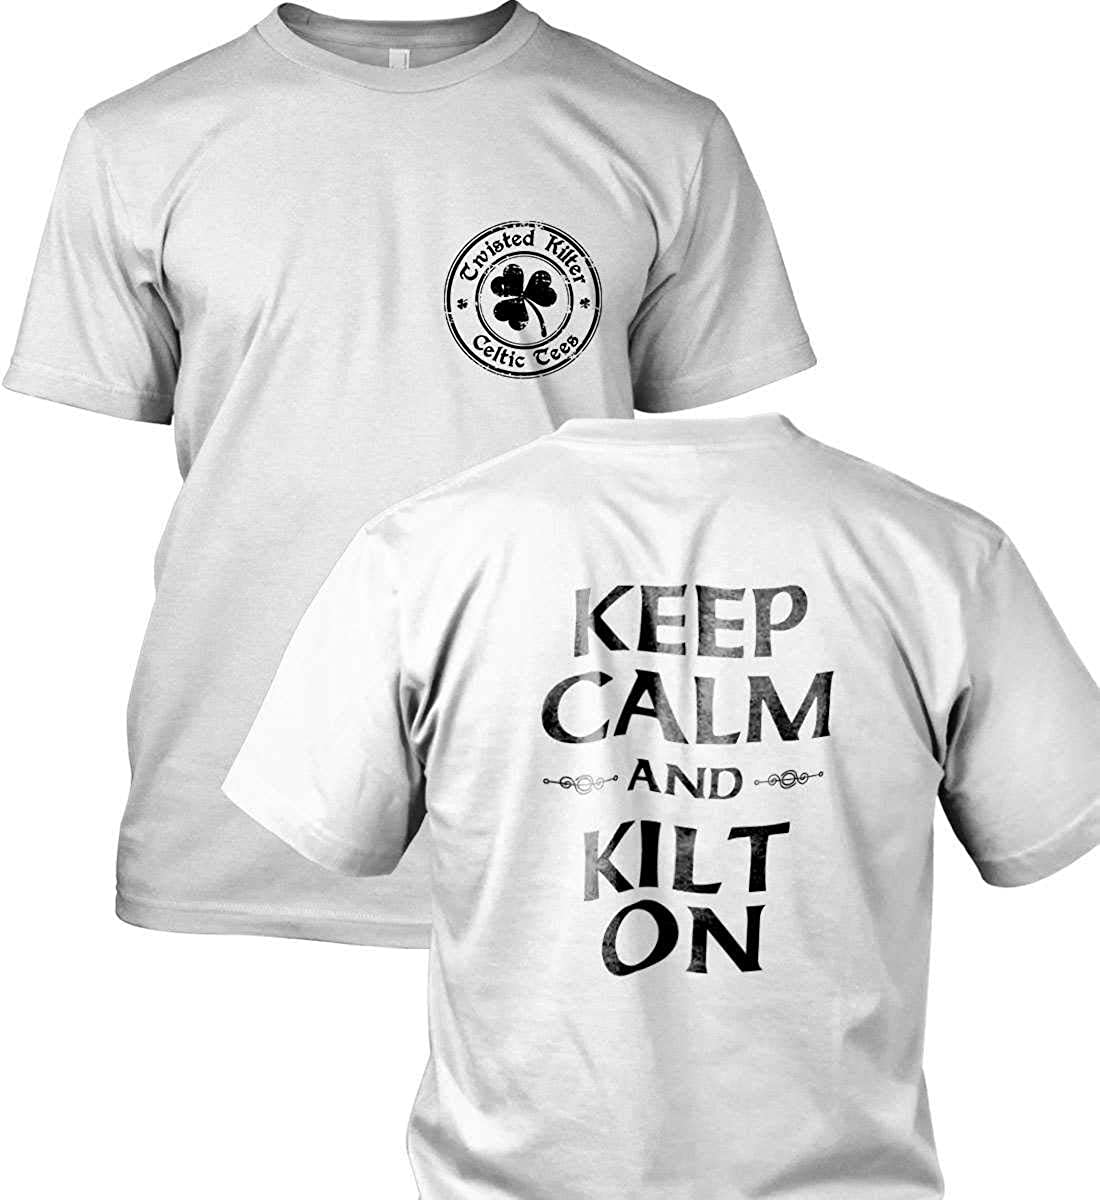 Kilt T-Shirt Made in USA T-Shir. Keep Calm and Kilt On Twisted Kilter Tees